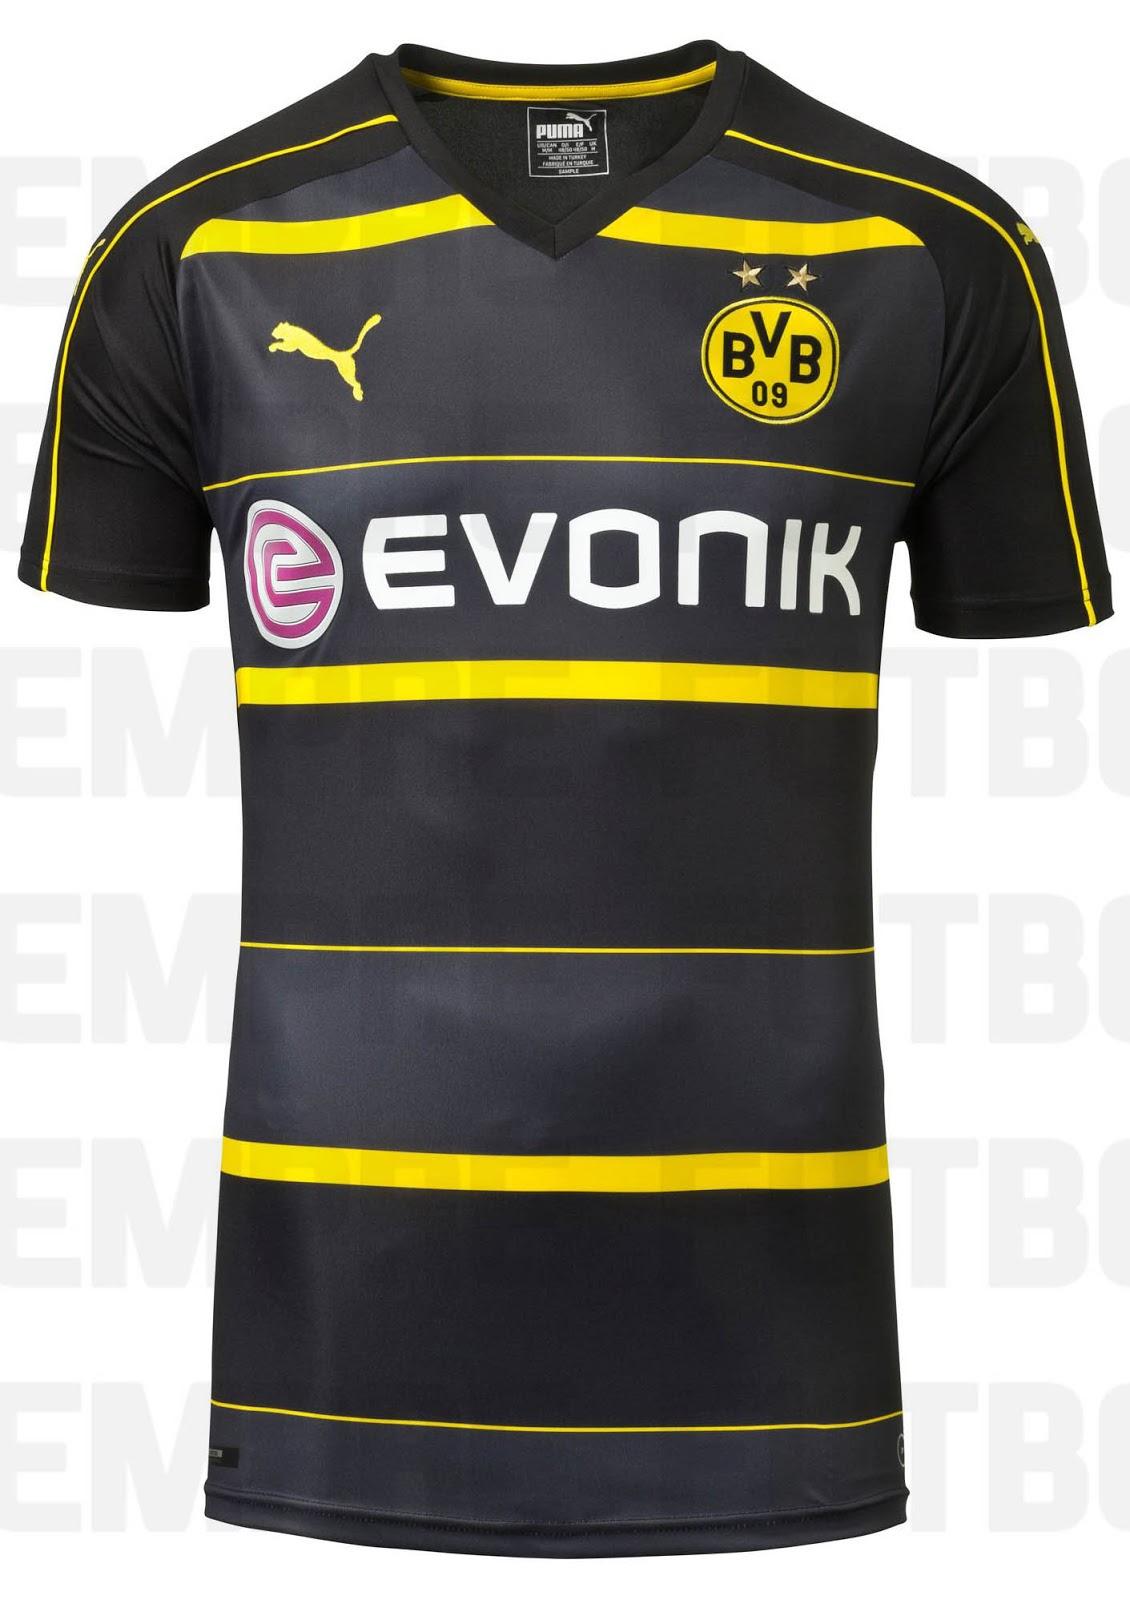 f6a3a0726 LEAKED! Borussia Dortmund 2016 17 Away Kit